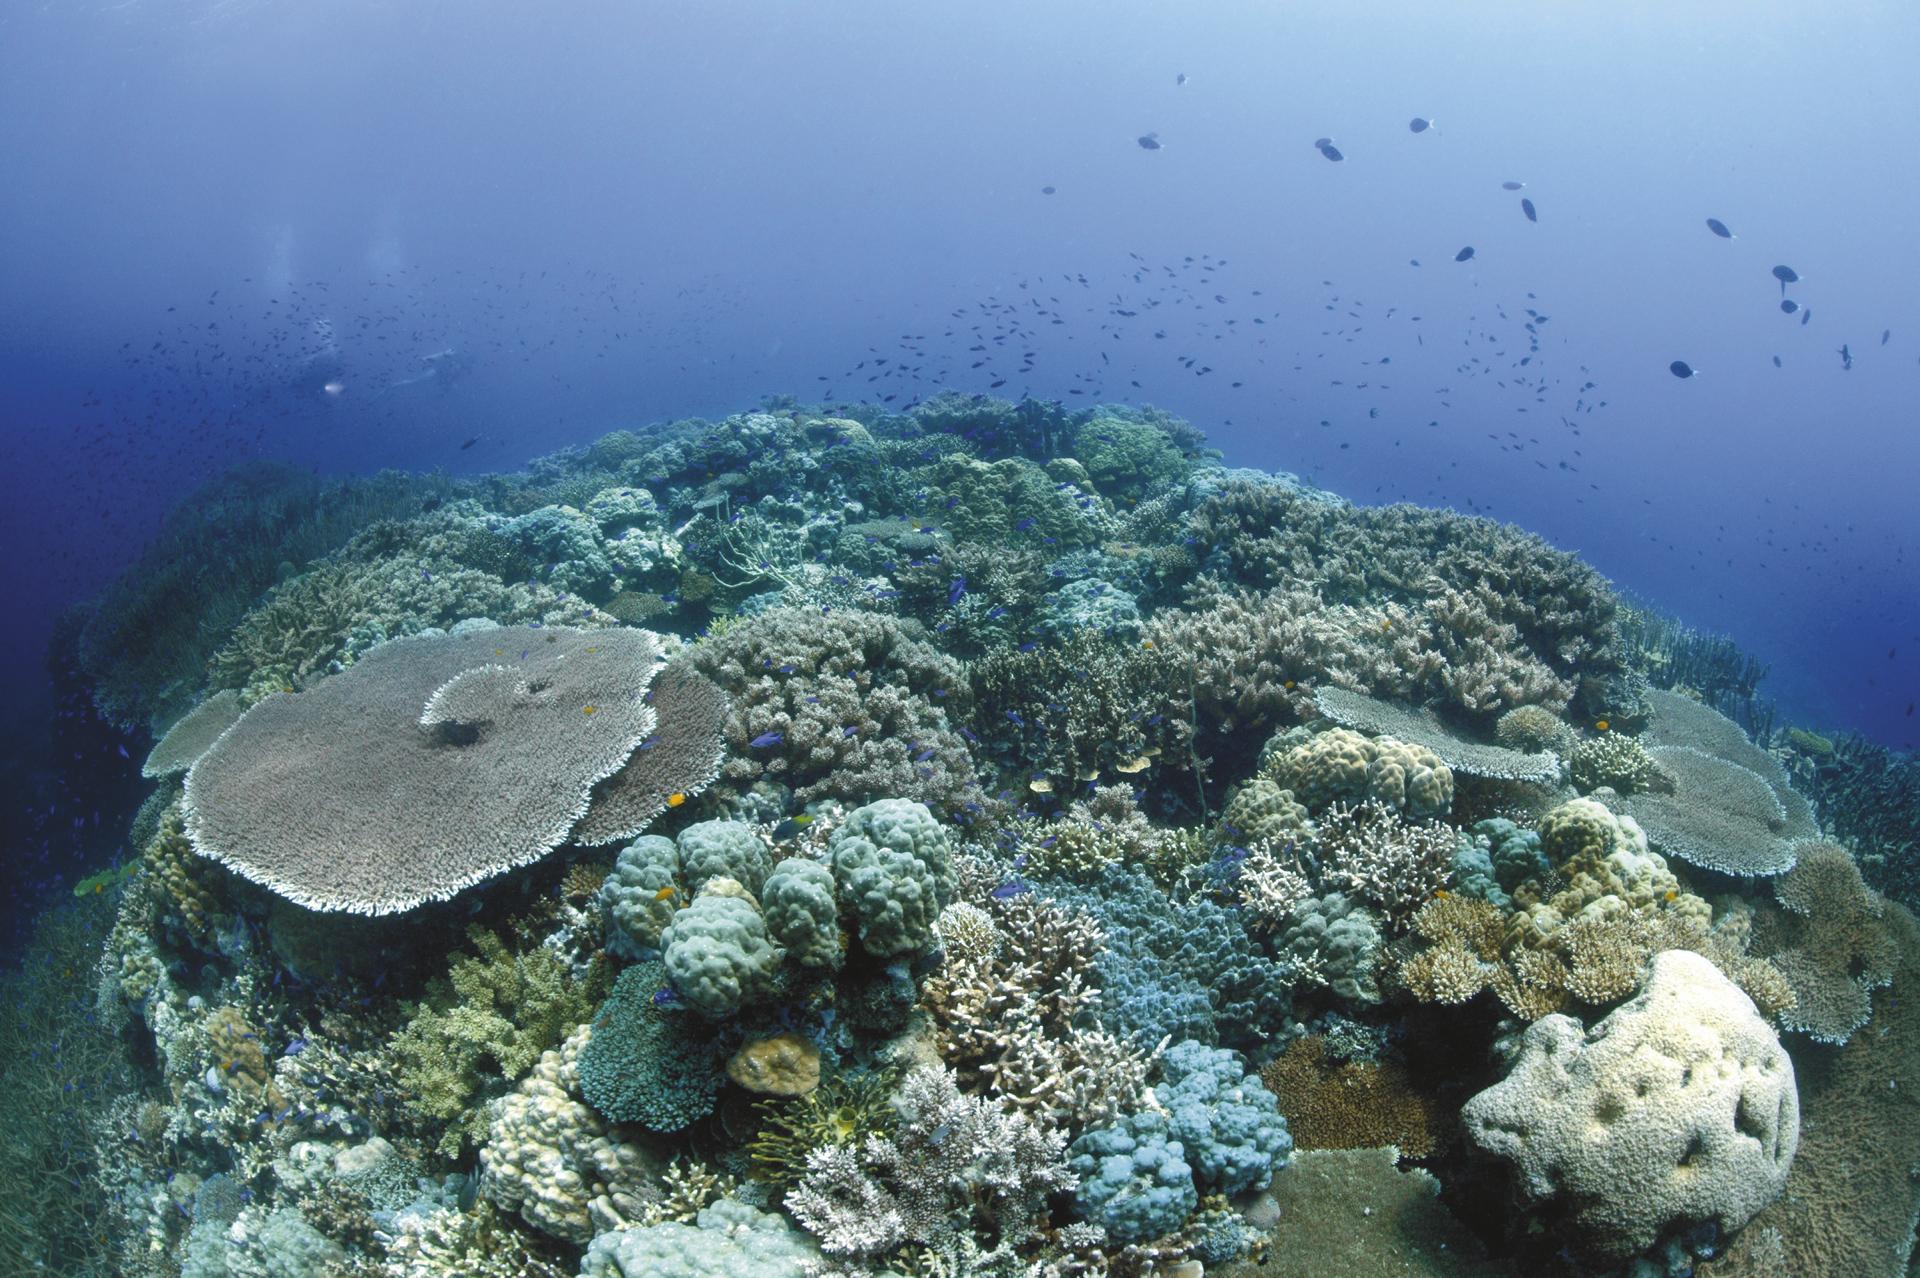 Tolles Korallenriff